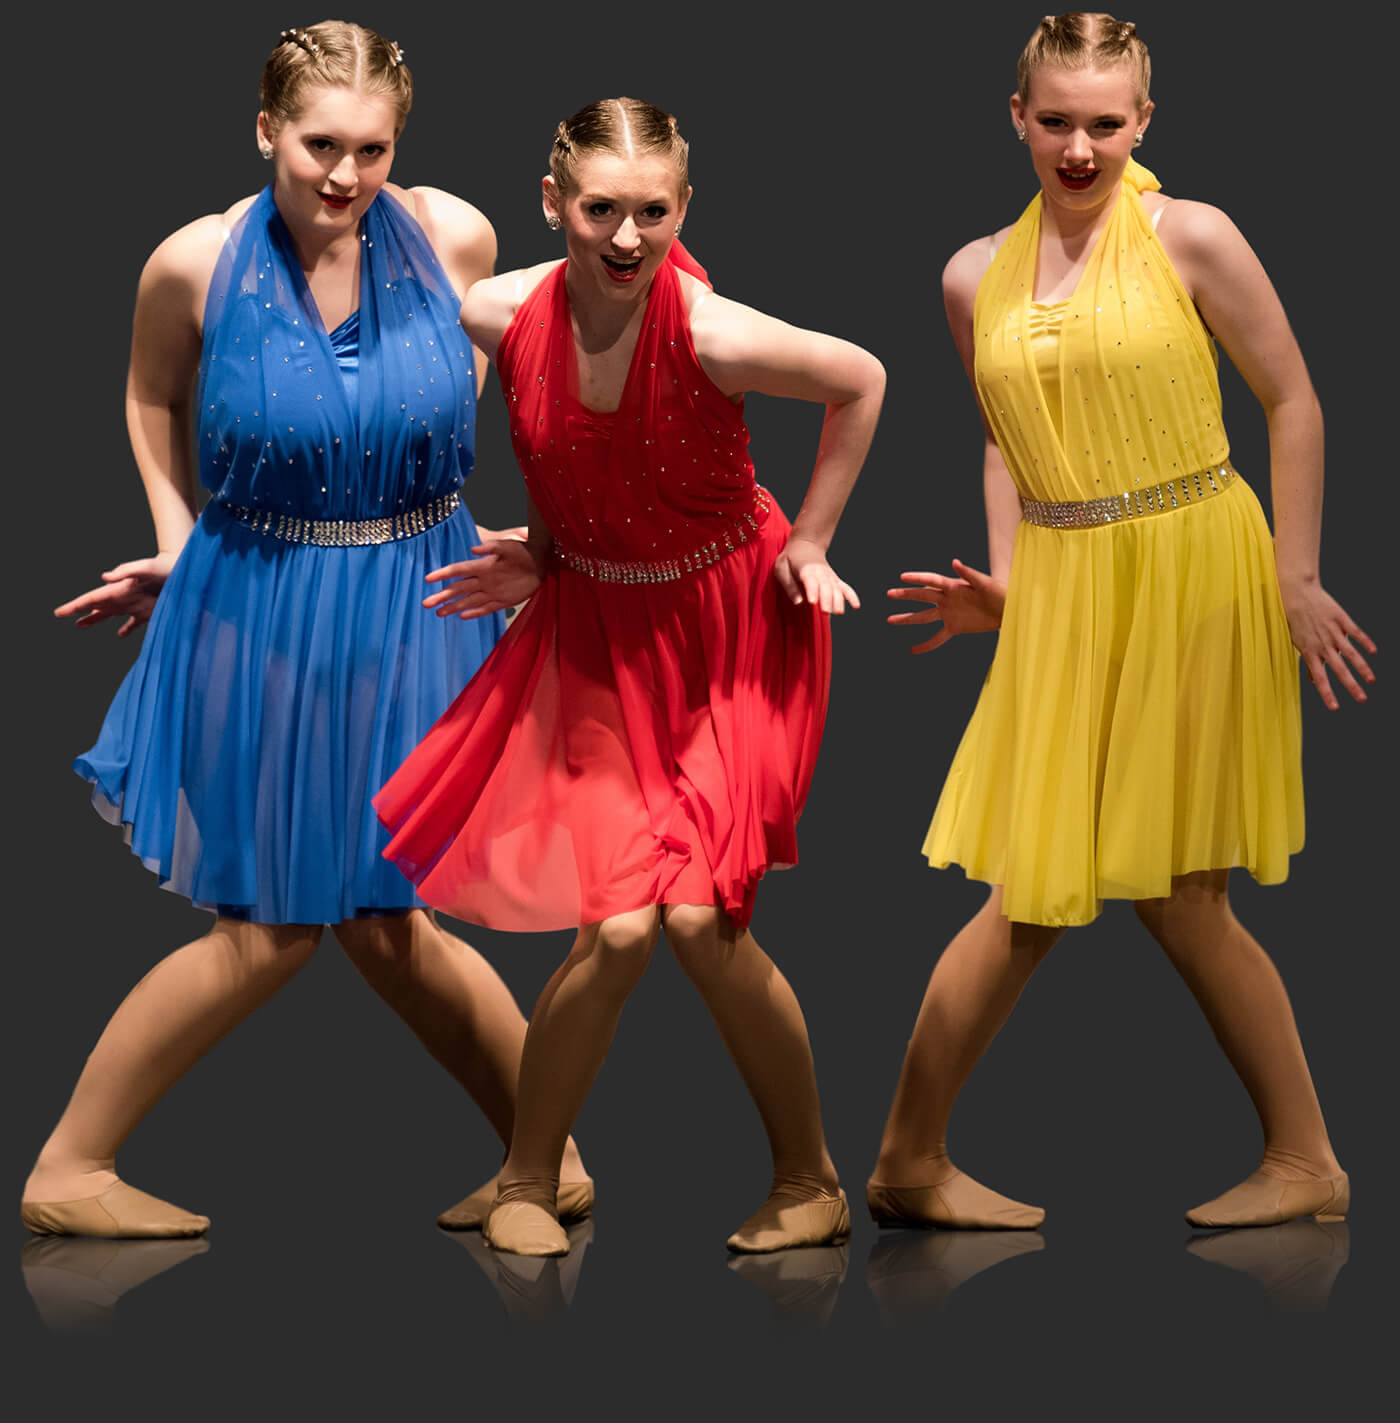 Musical theatre dancers